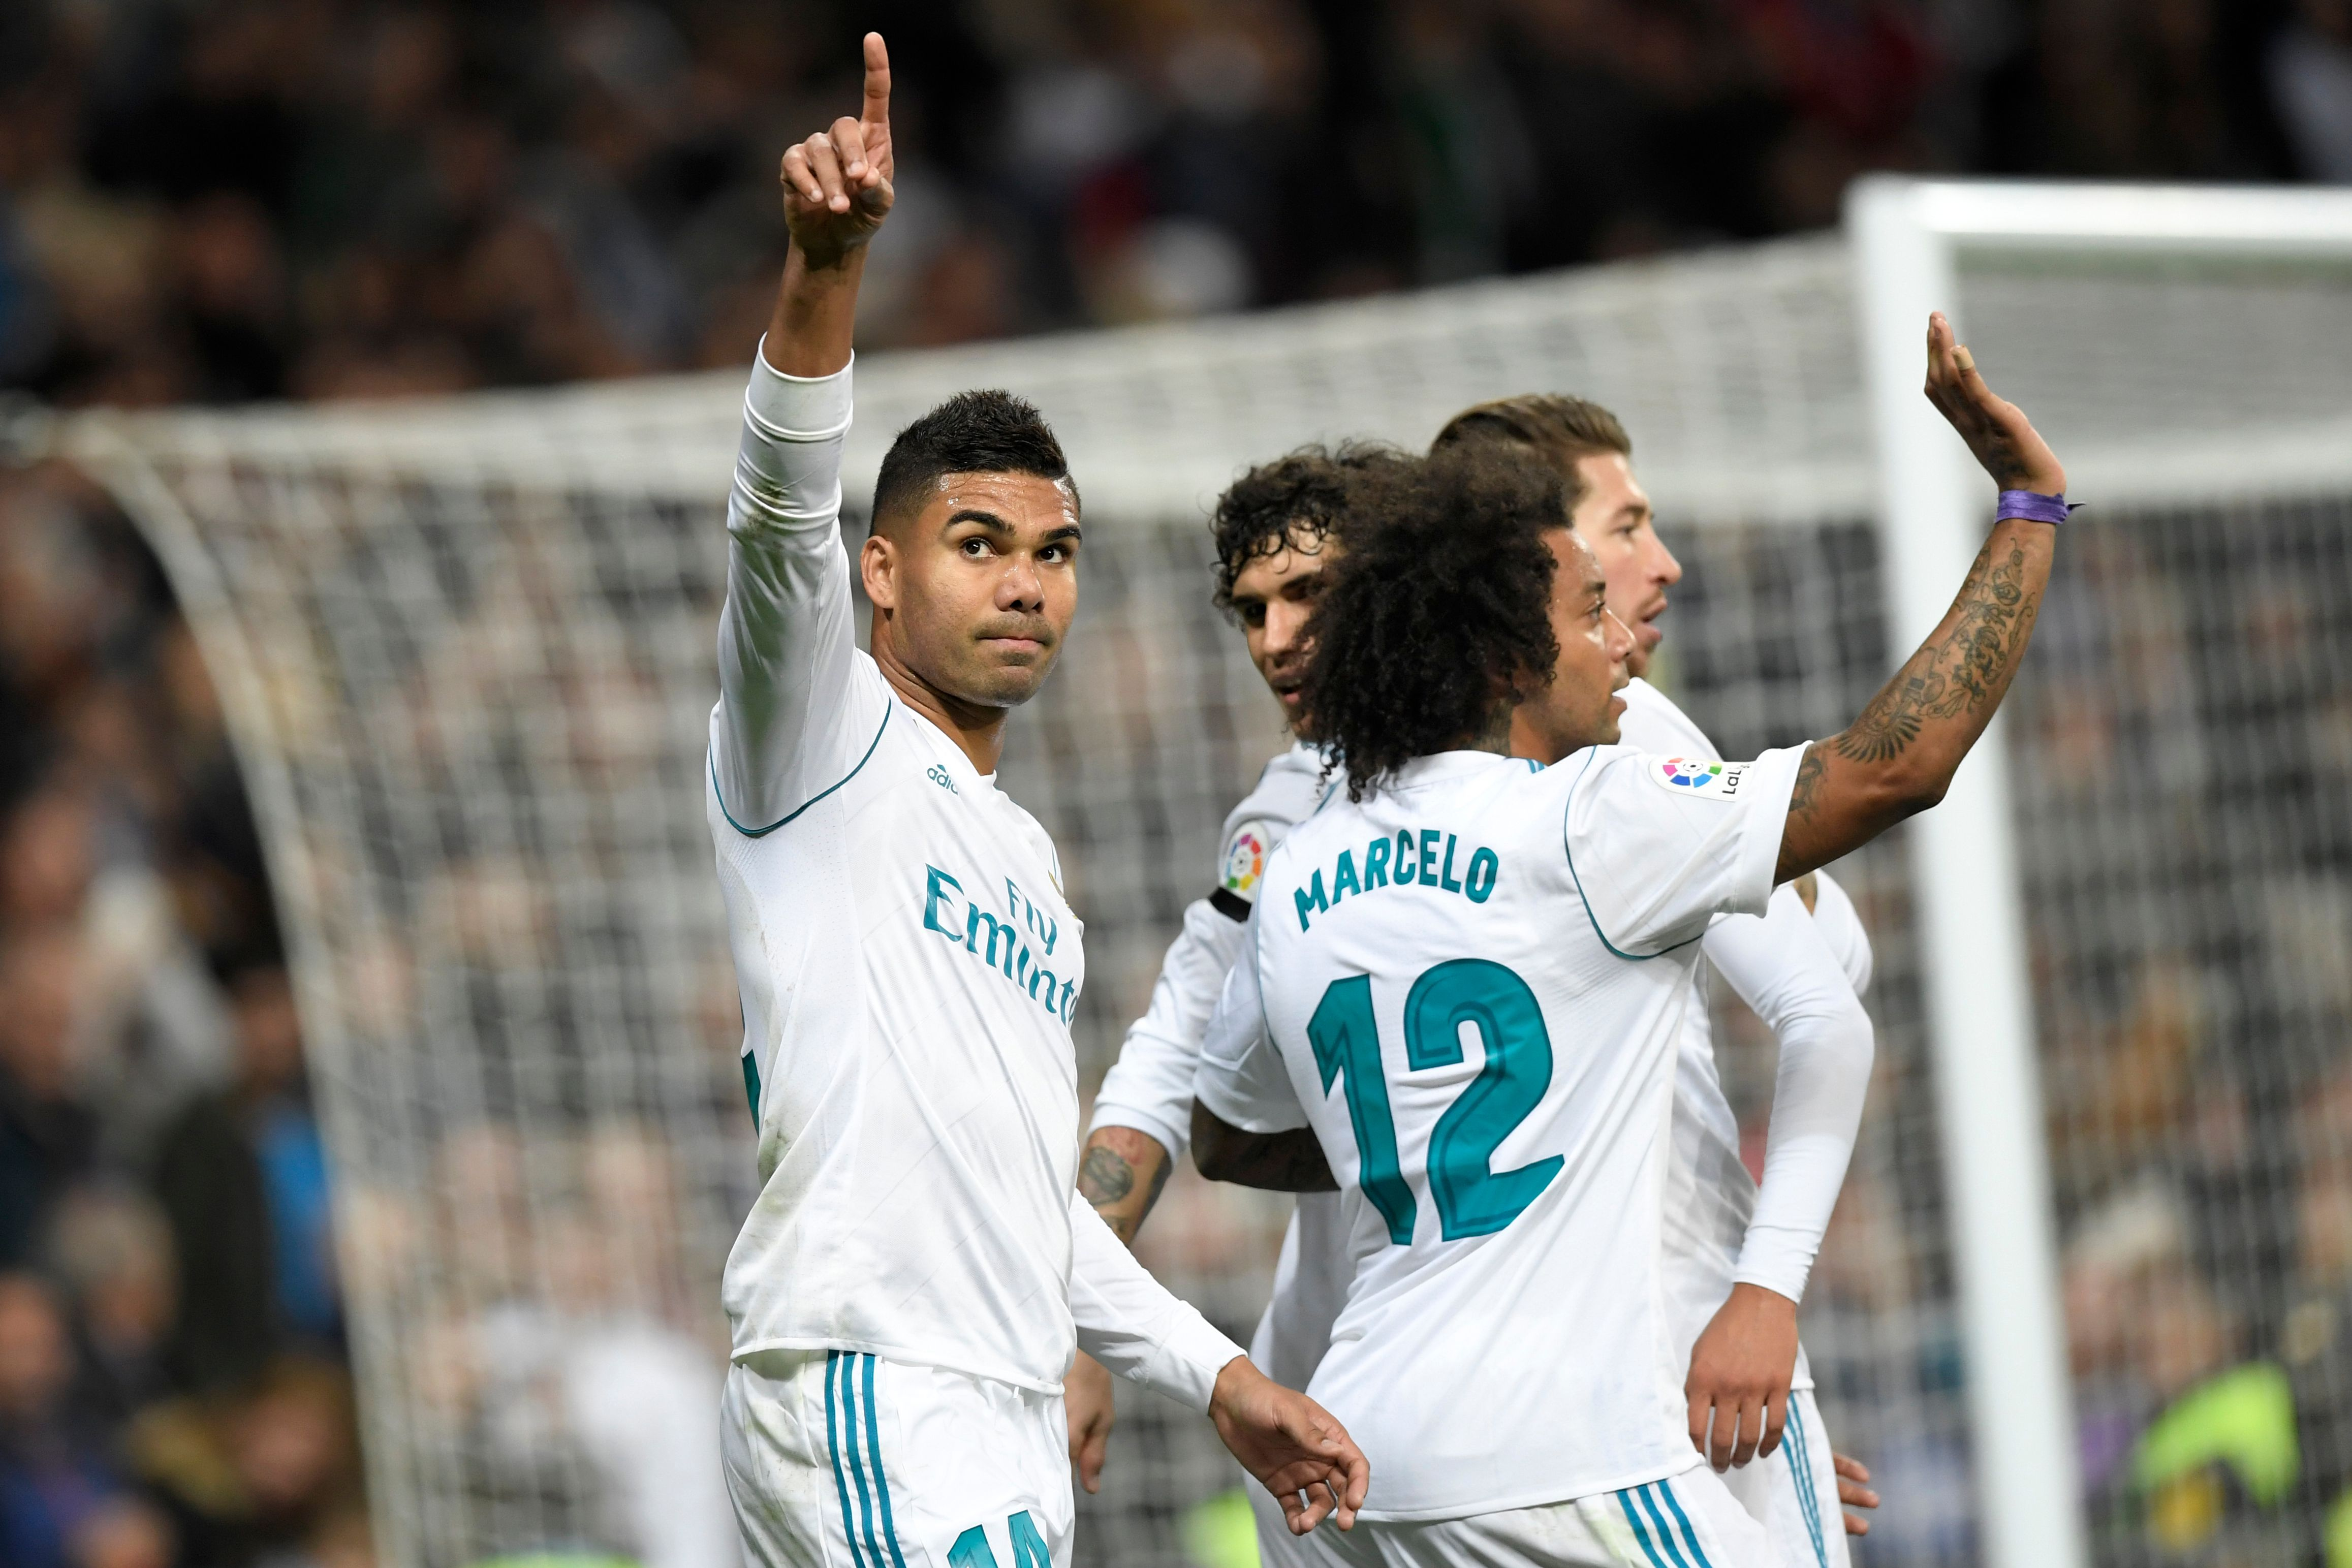 Real Madrid 3 0 Las Palmas quick recap from La Liga Matchweek 11